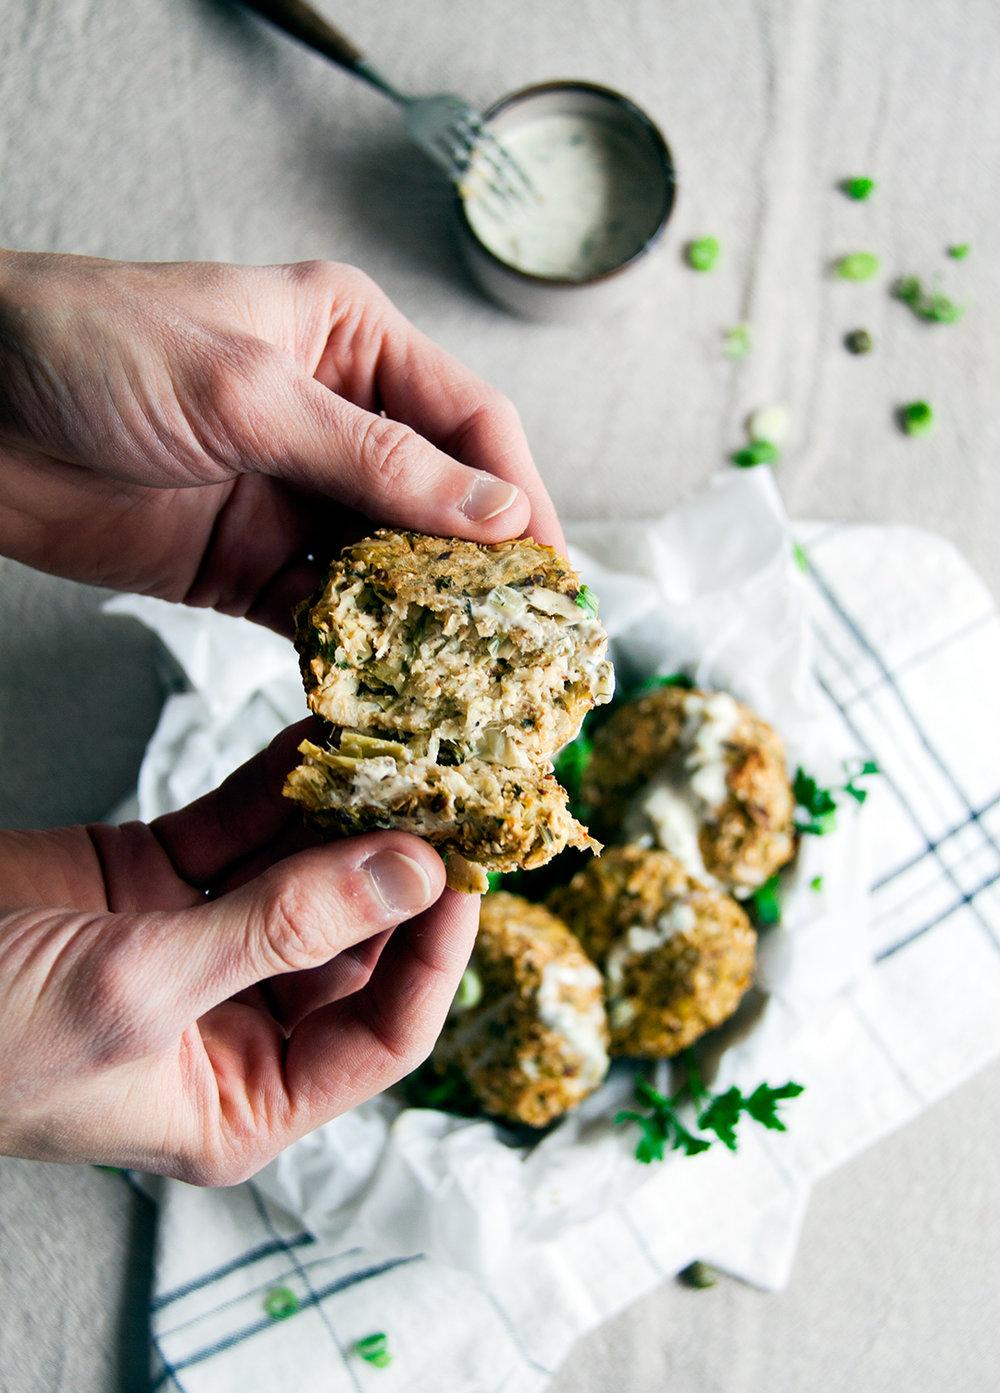 vegan-crabcakes-vegan-whole-foods-olievrij-02.jpg